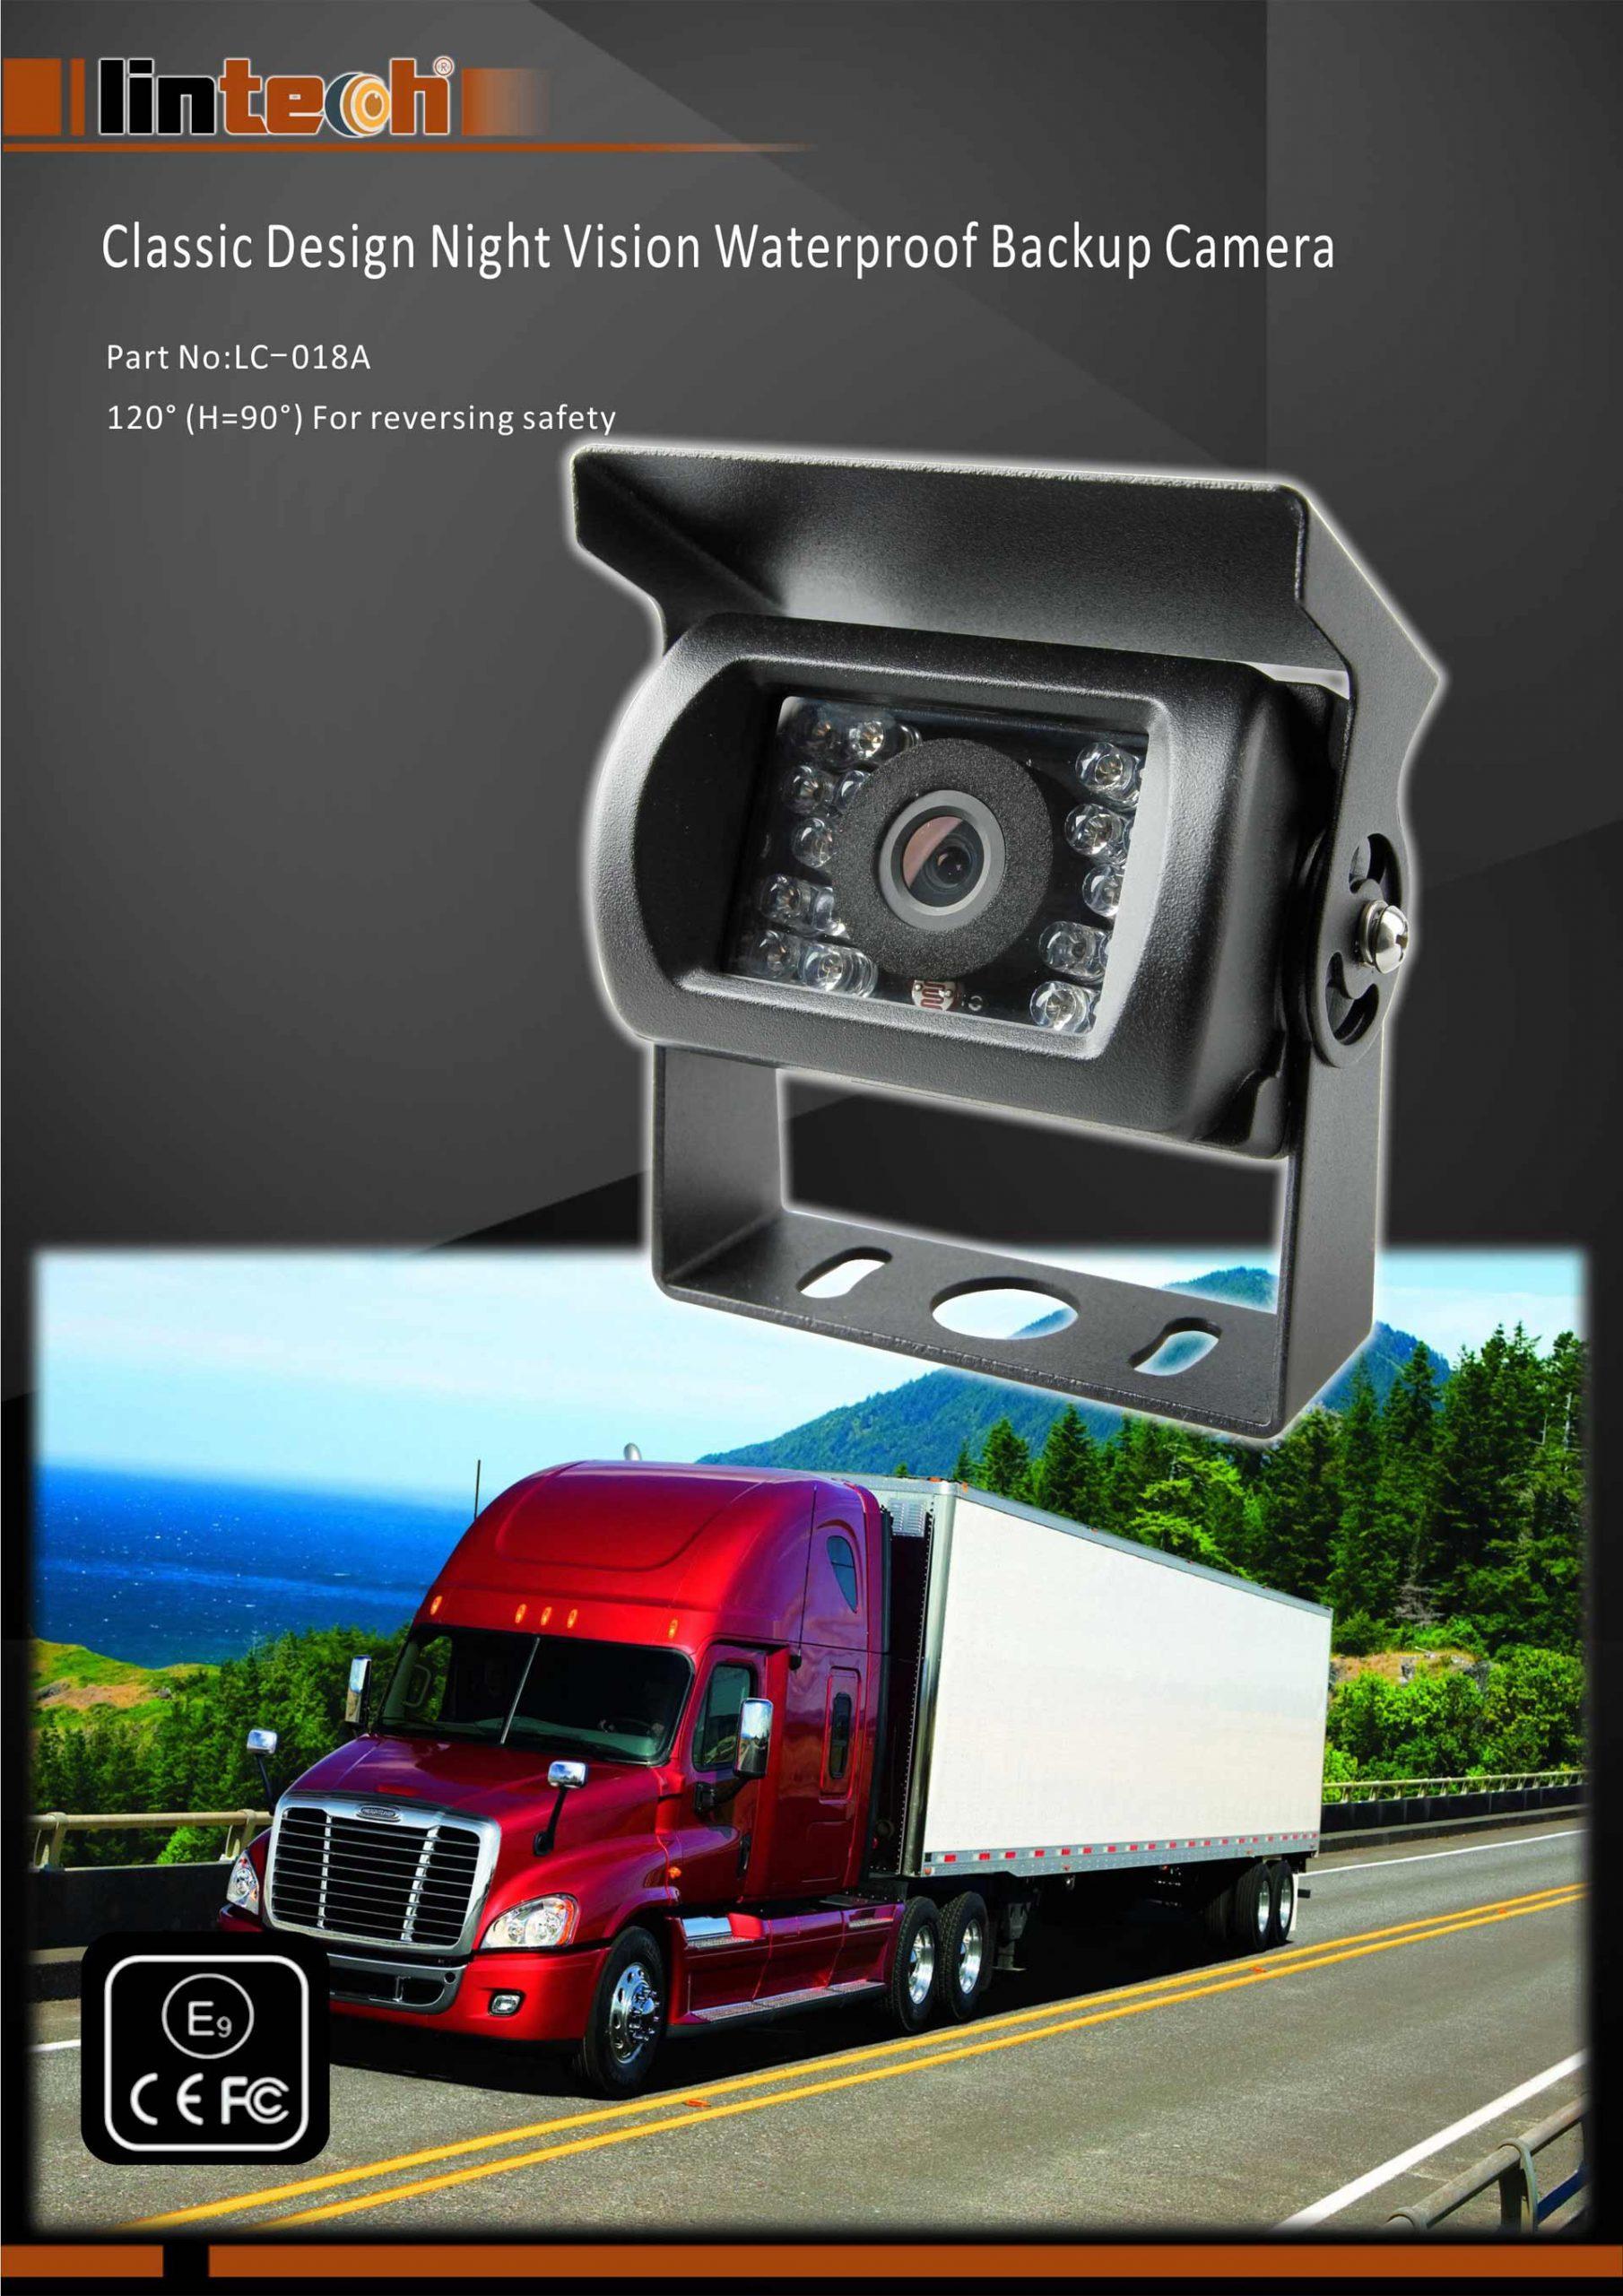 1.Classic-Design-Night-Vision-Waterproof-Backup-Camera